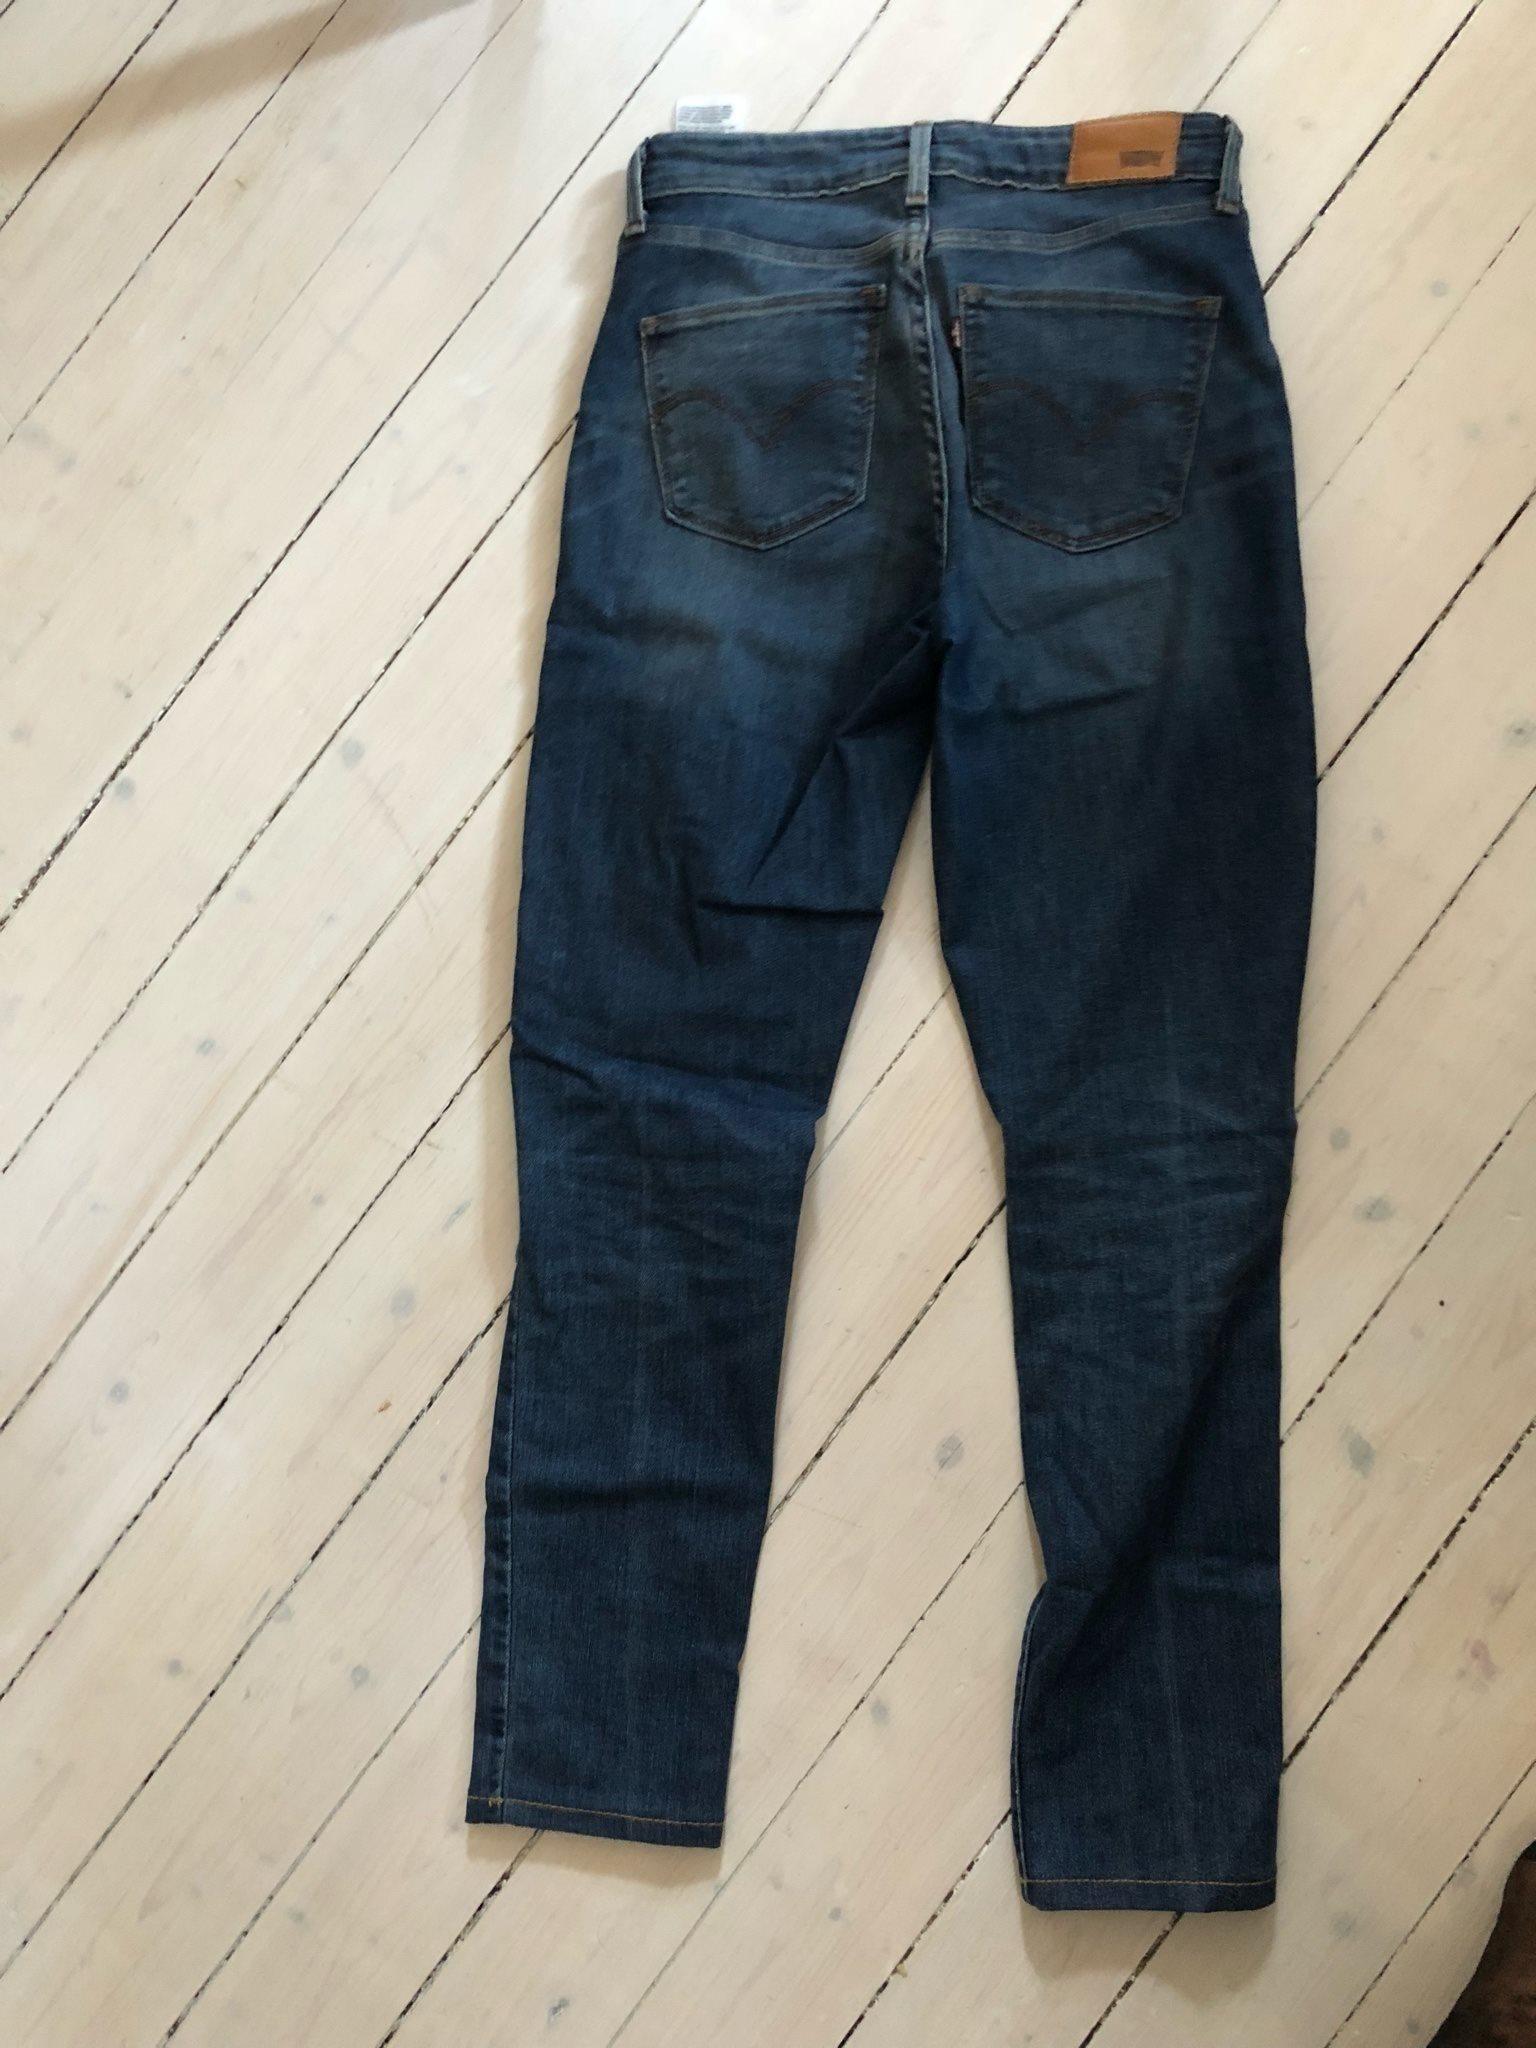 dbc47c3382d Levis jeans storlek 26 (343596447) ᐈ Köp på Tradera